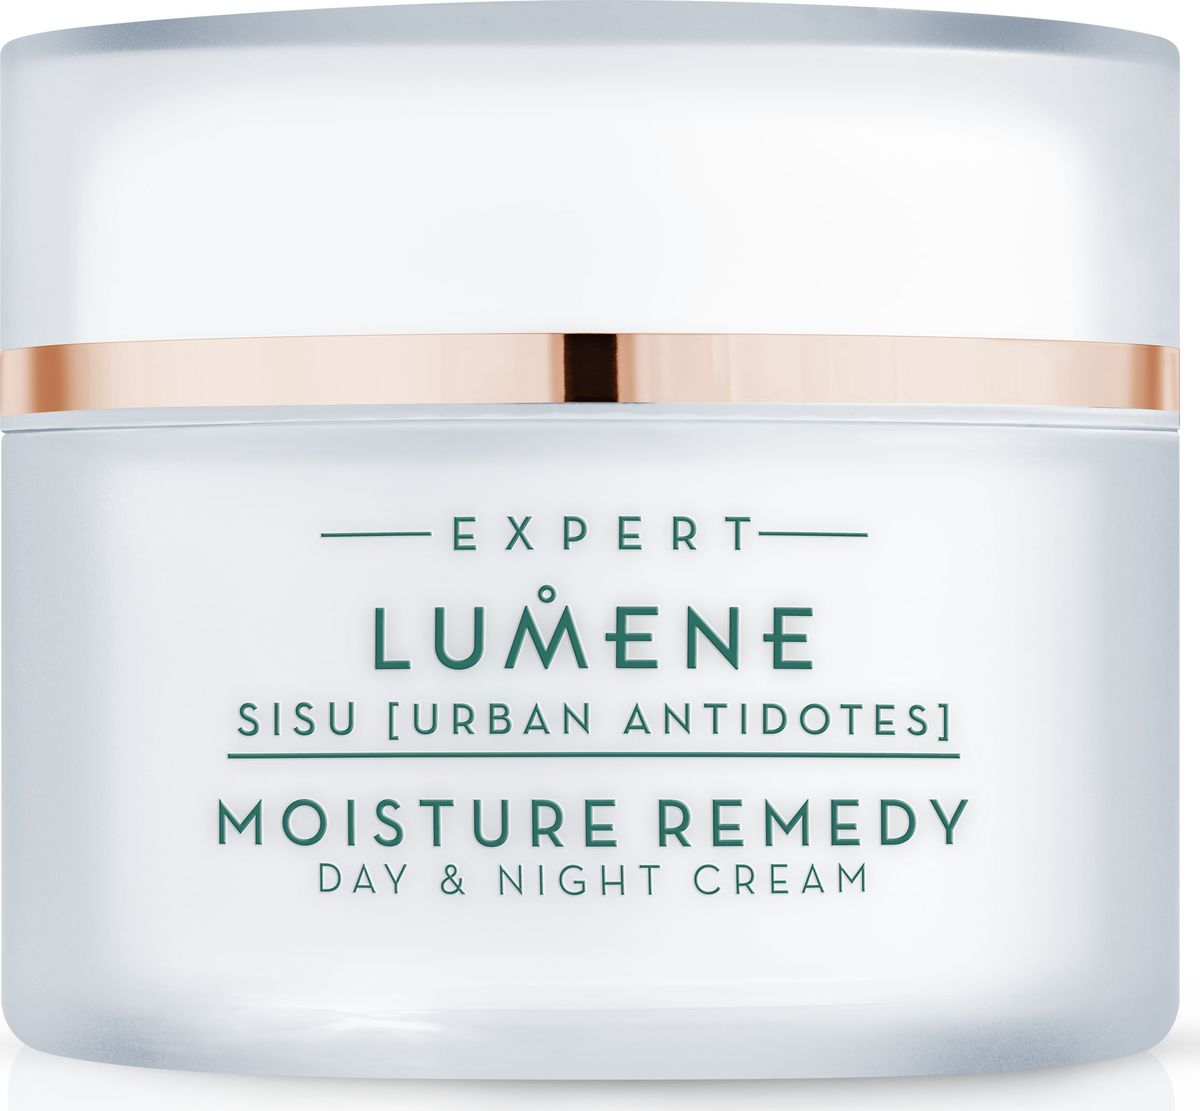 Lumene Sisu Дневной и ночной увлажняющий крем-уход , 50 мл lumene lahde hydration recharge overnight cream крем ночной увлажняющий восстанавливающий 50 мл